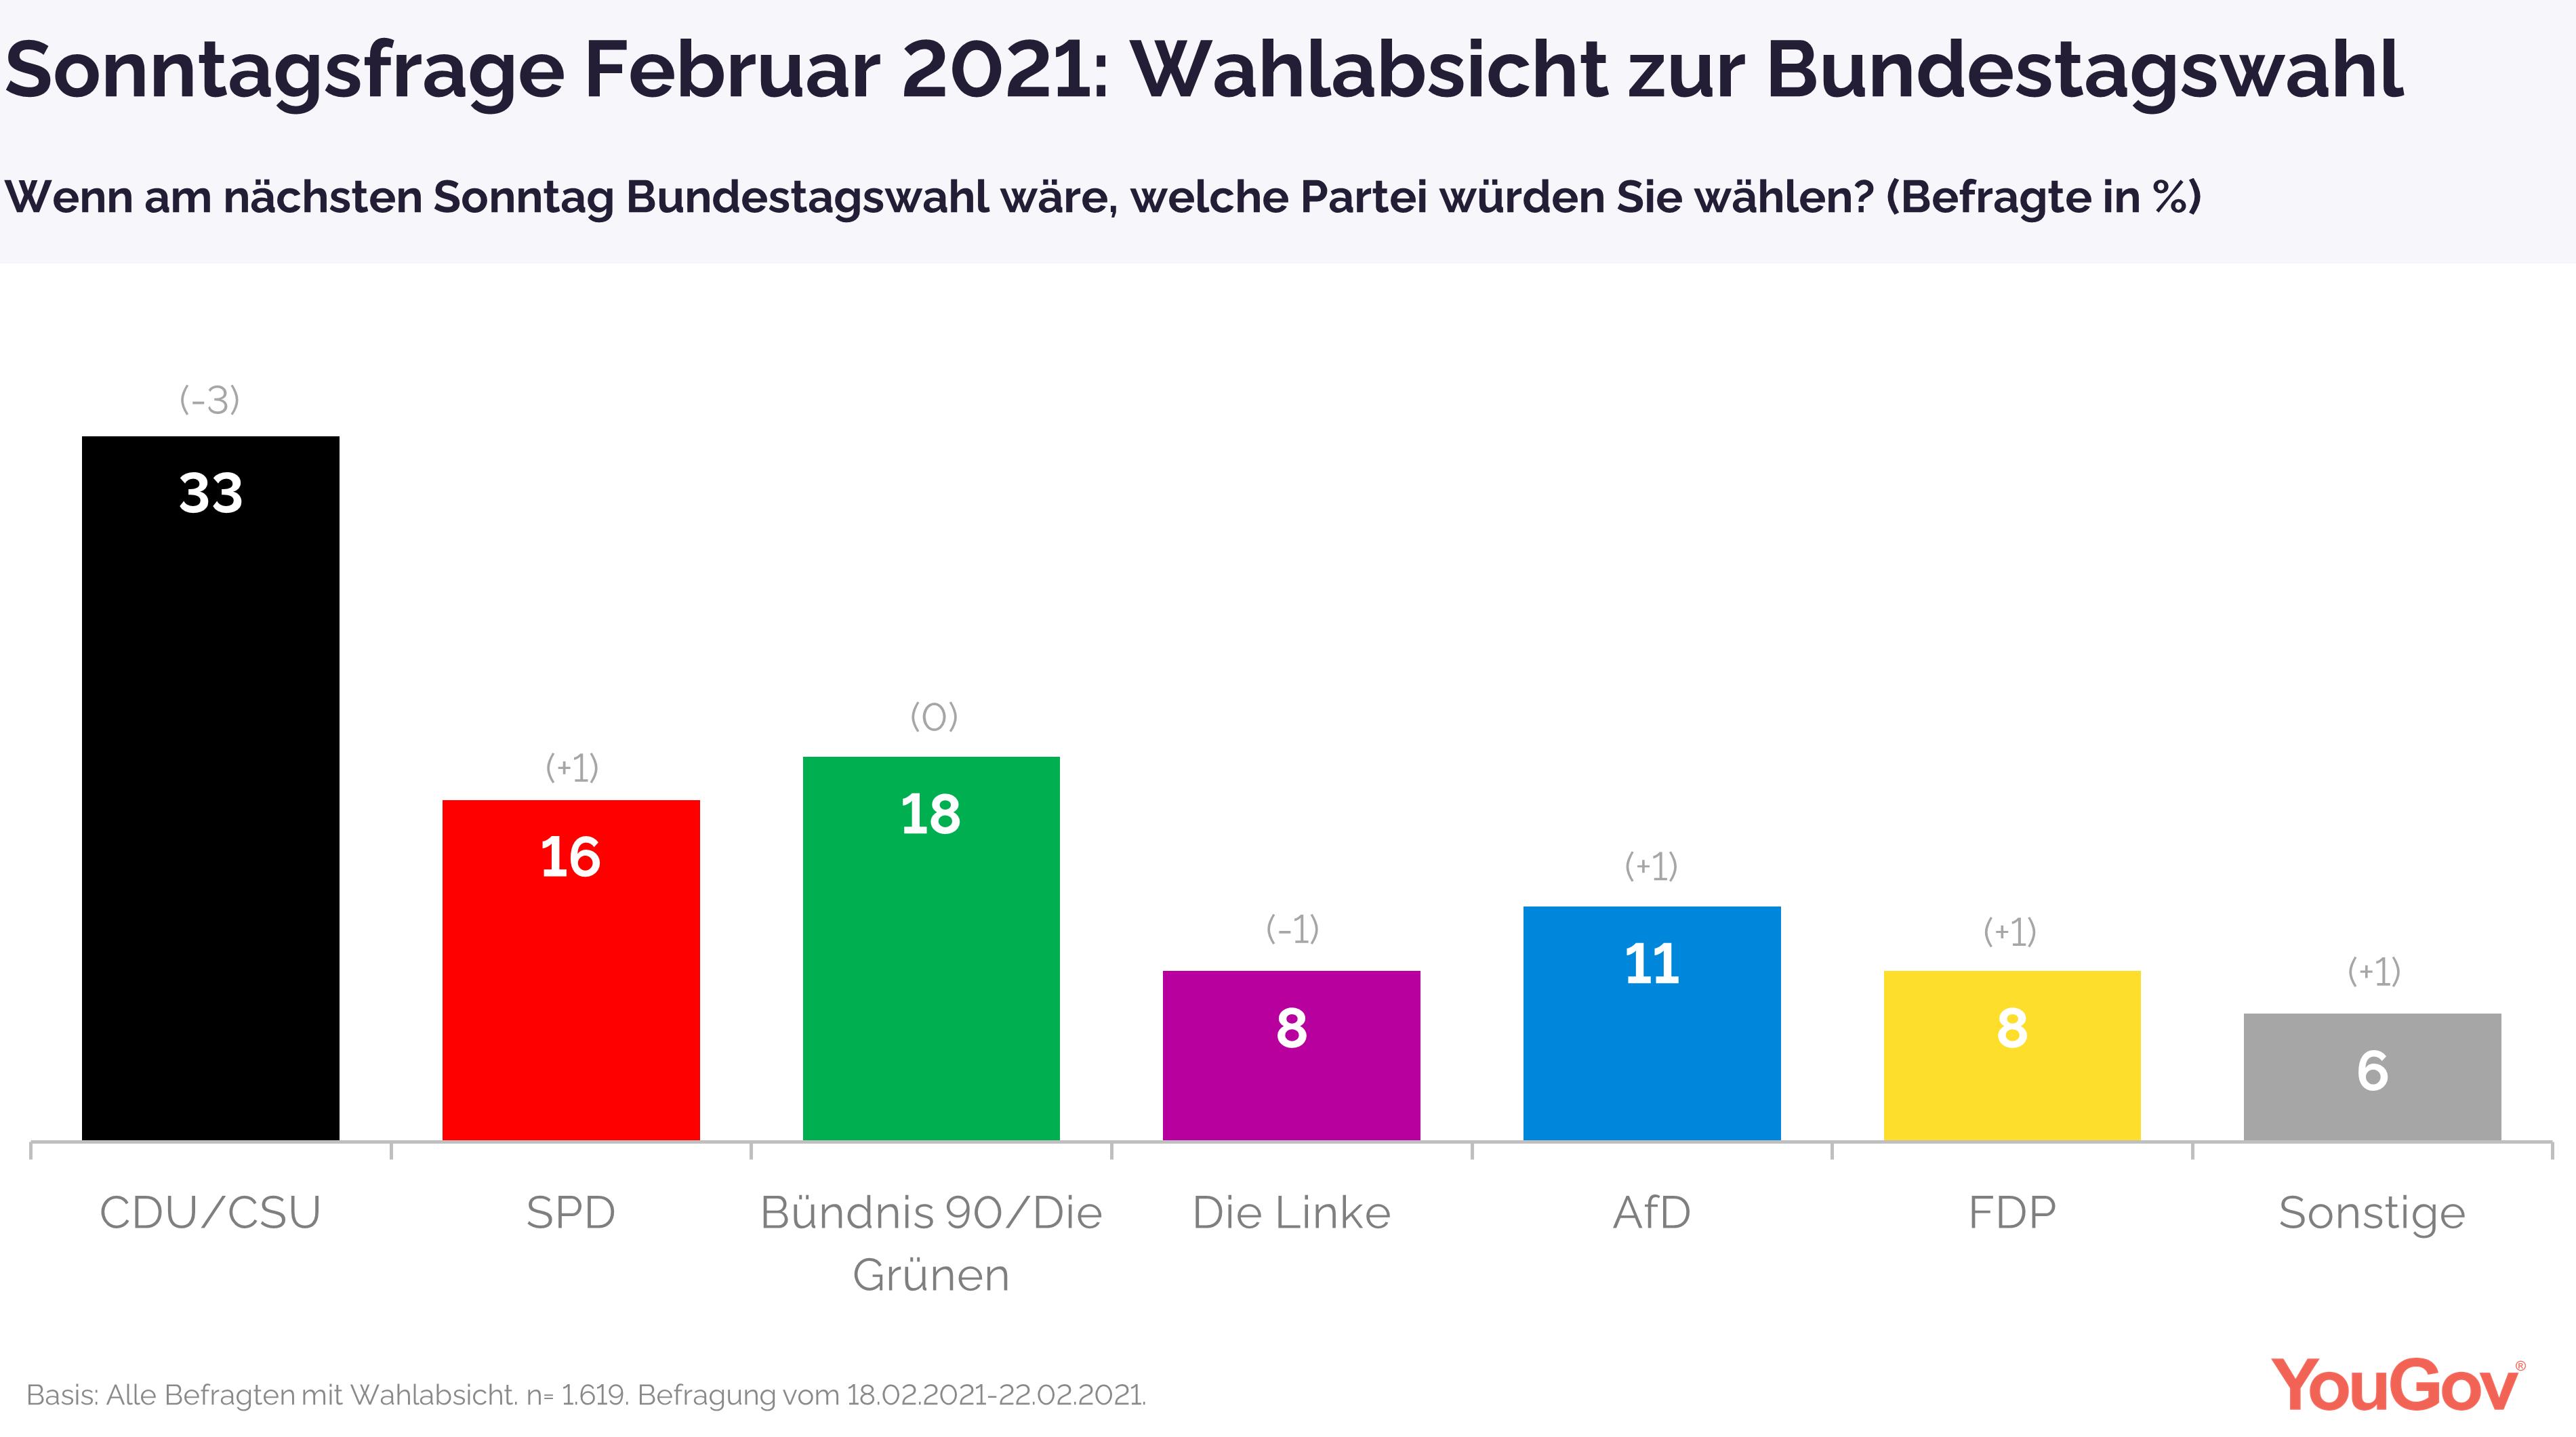 Wahlabsicht Sonntagsfrage Februar 2021